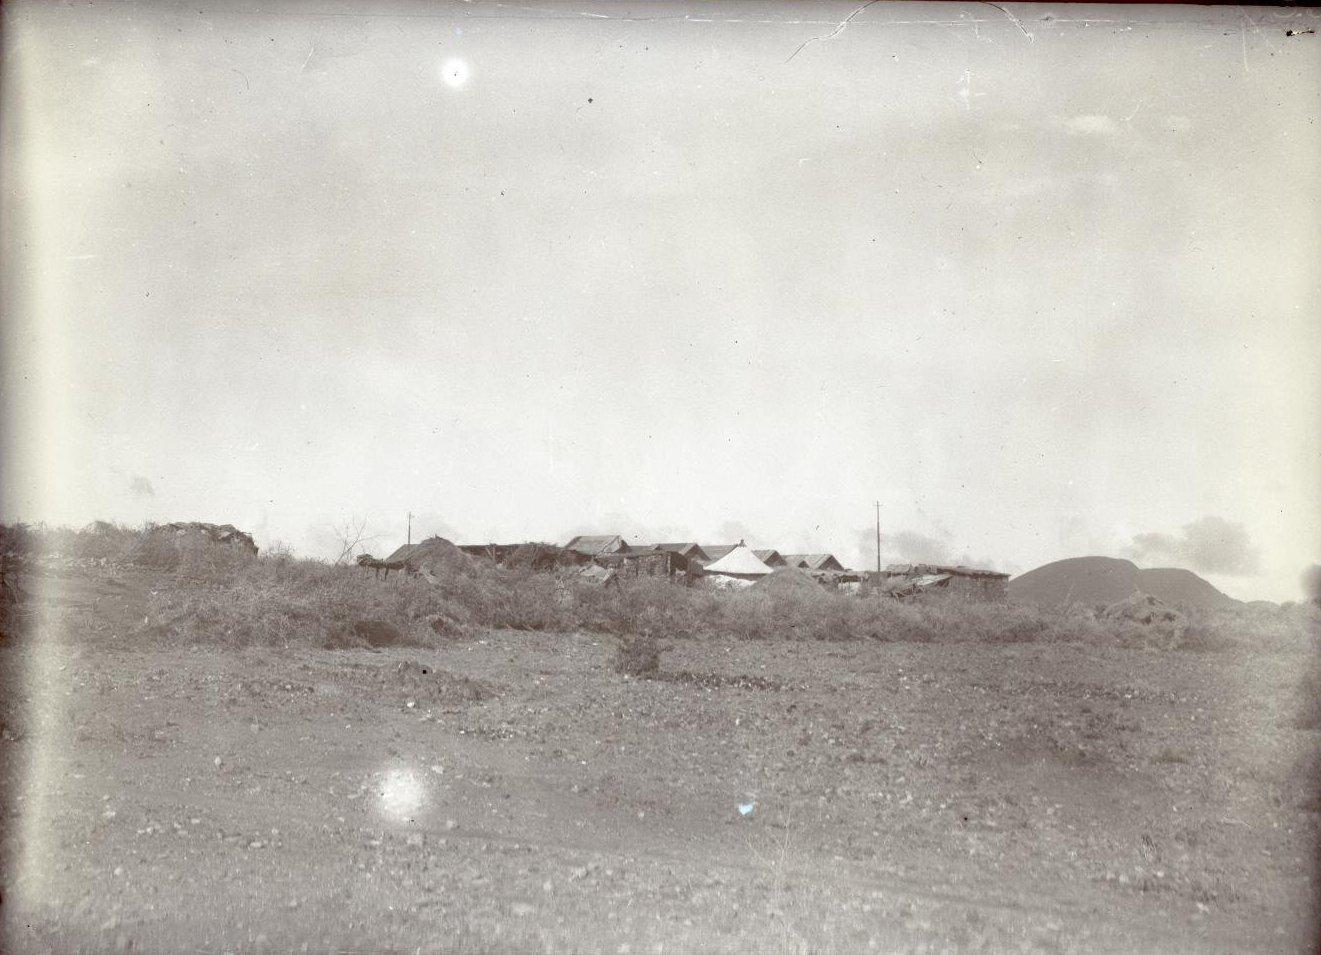 336. 1899. Абиссиния. г. Аддис-Абеба. Бульга. ставка императора Менелика